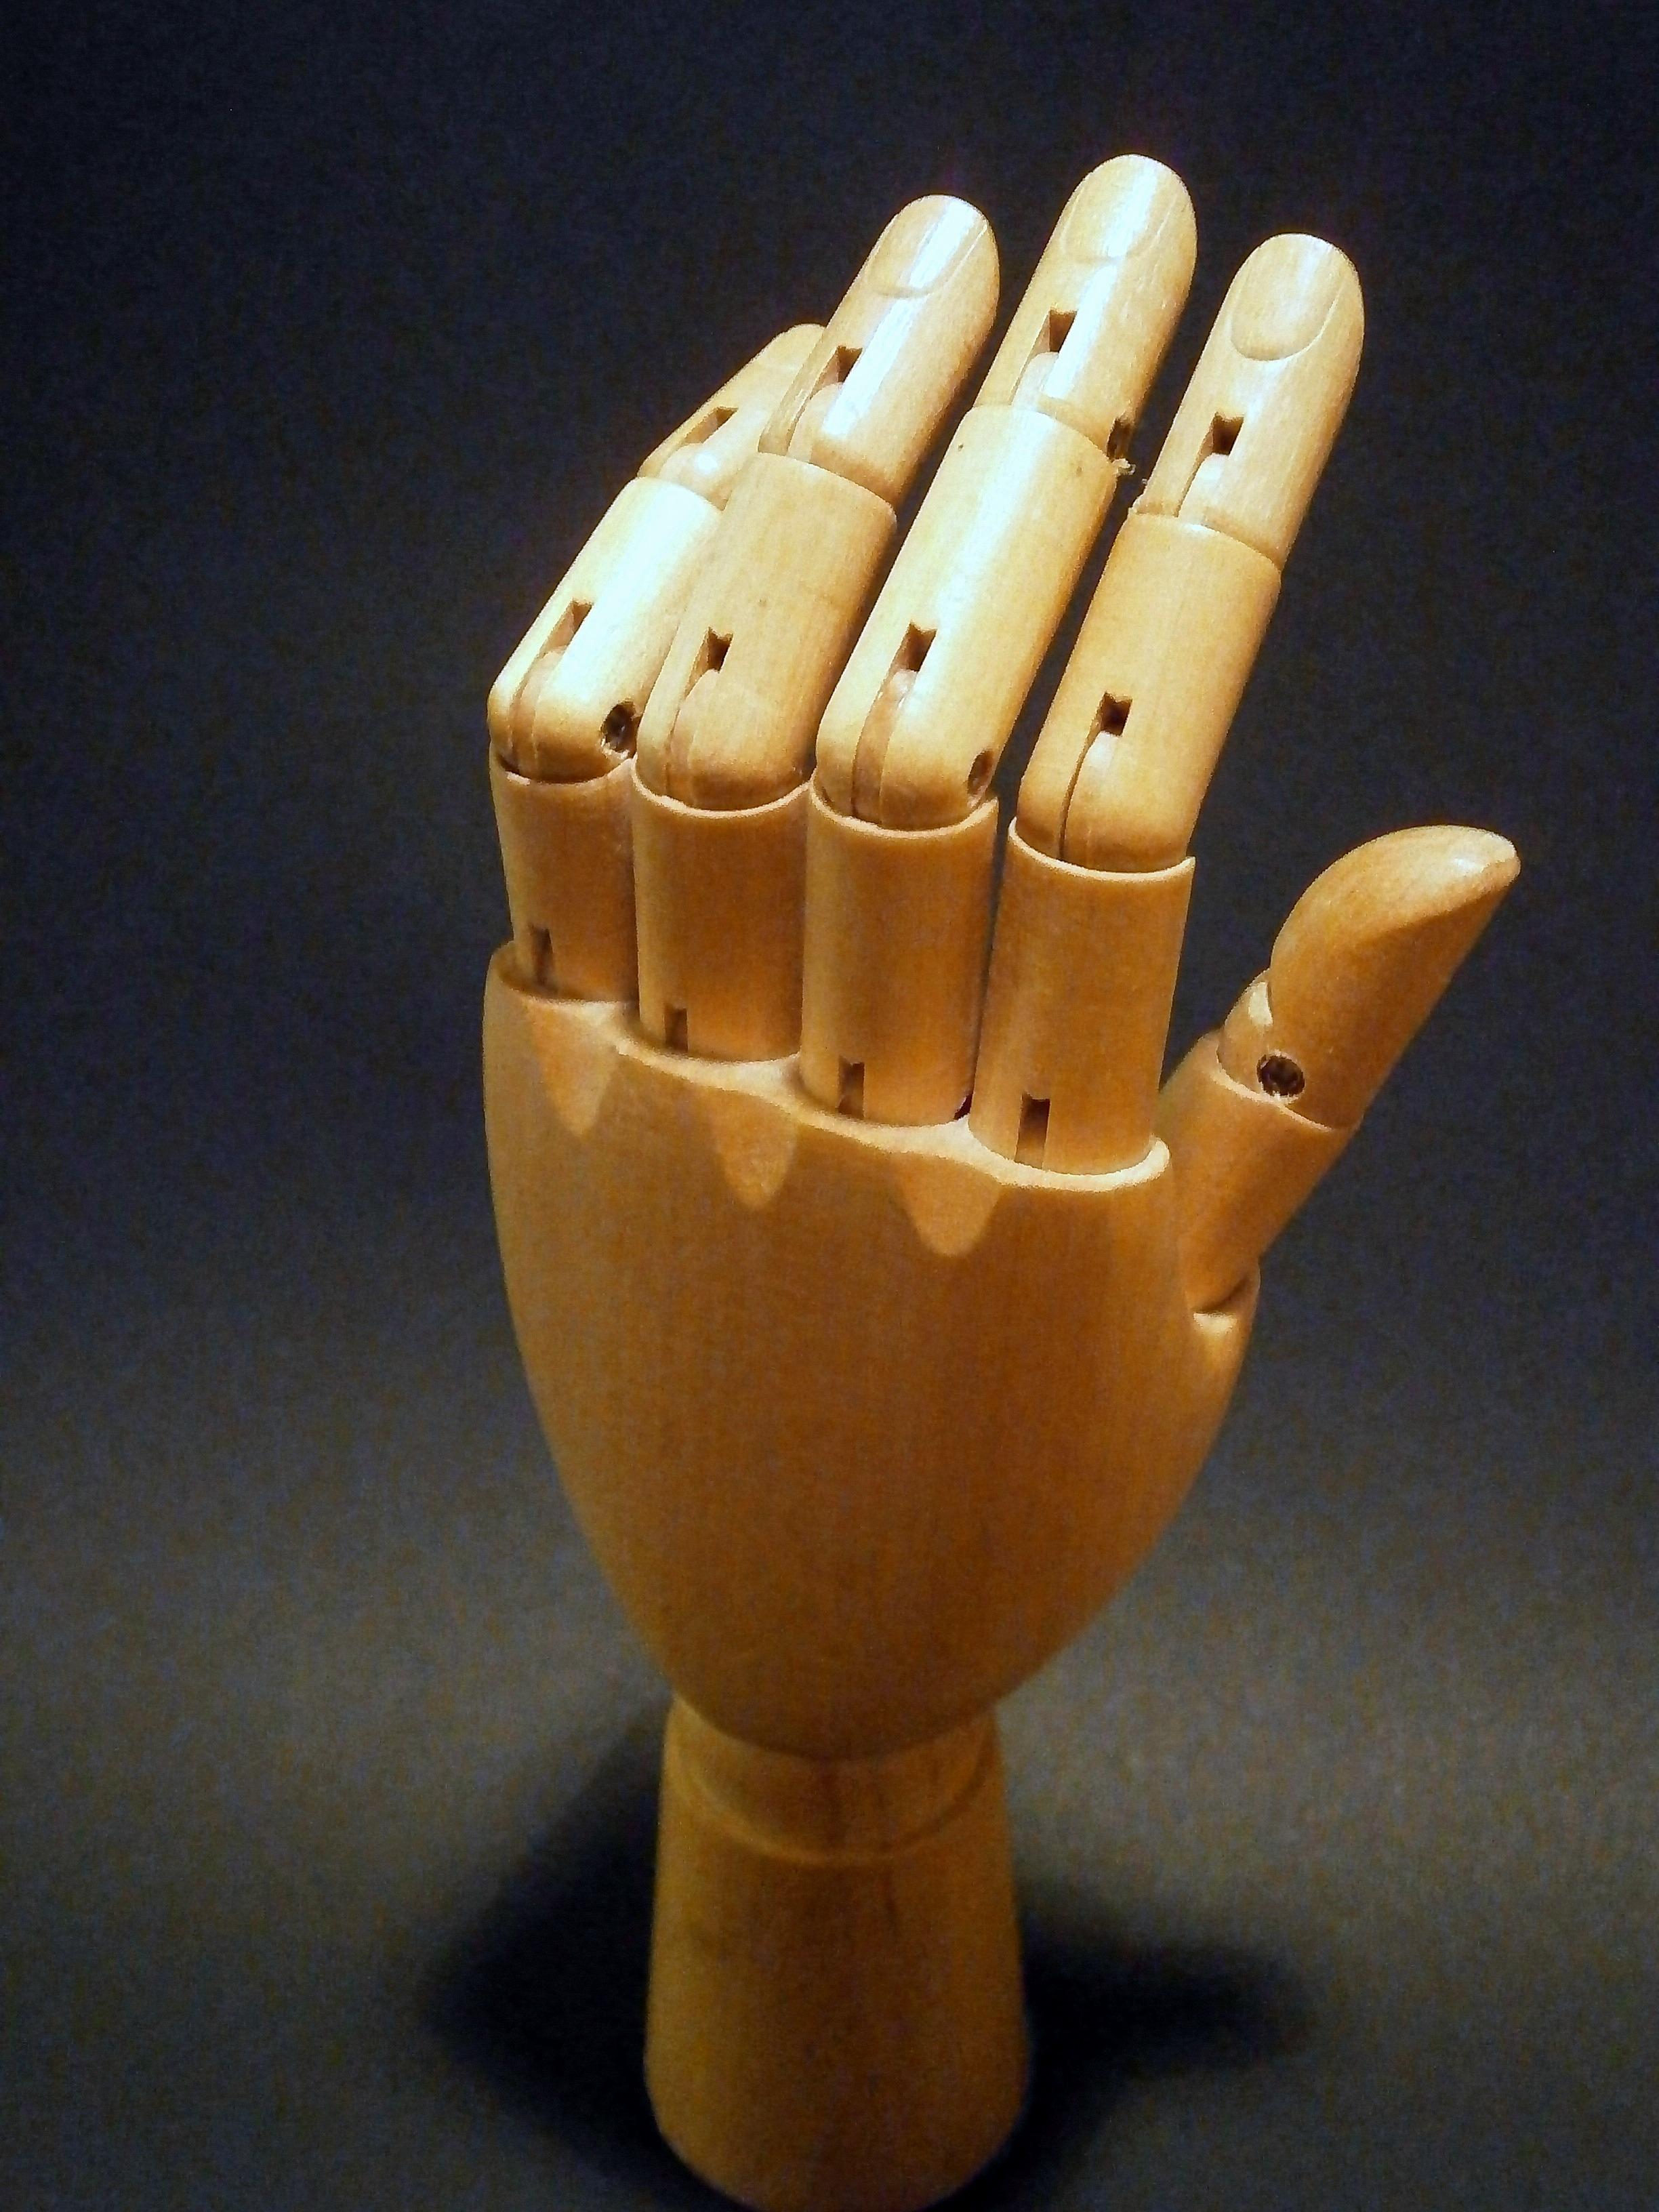 Free Images : wood, perspective, decoration, finger, ceramic ...